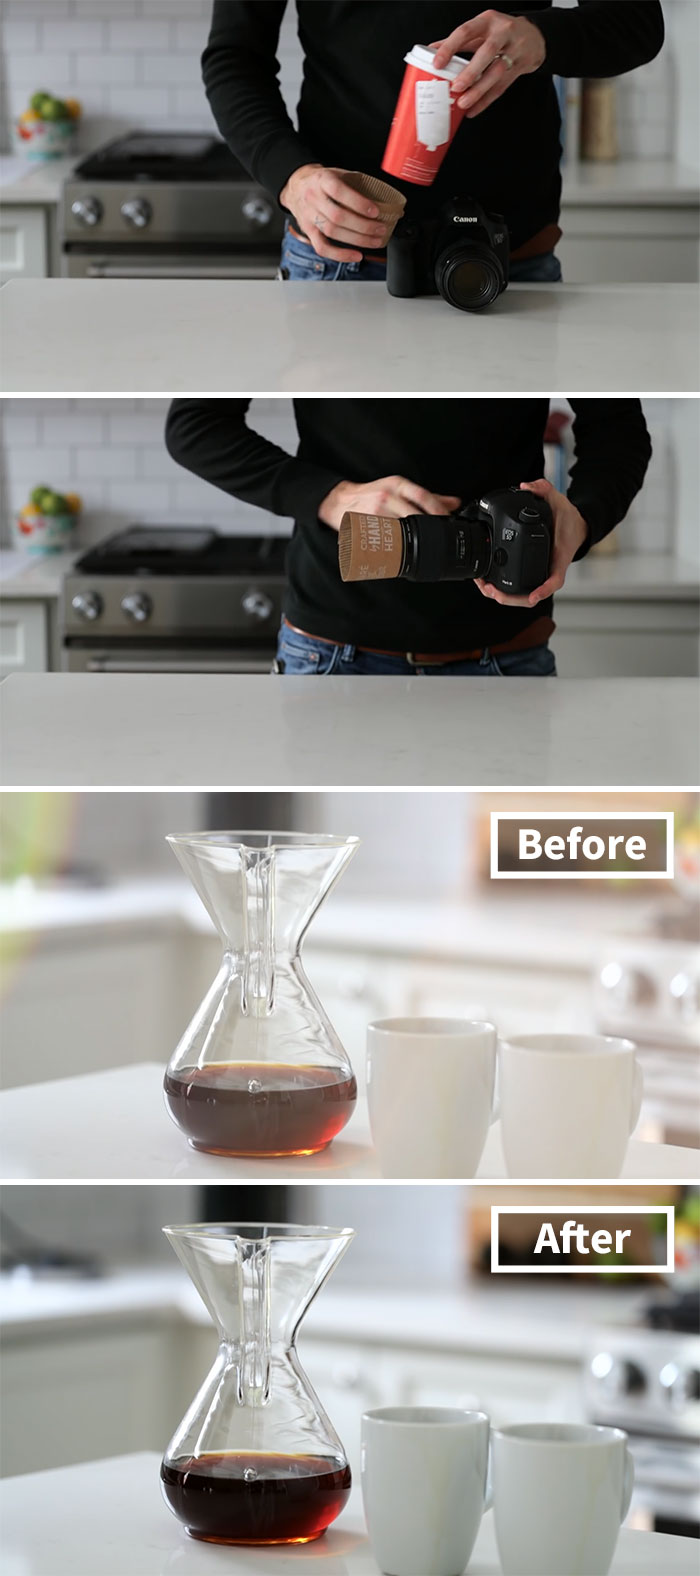 easy-camera-hacks-how-to-improve-photography-skills-41-597058babd07f__700